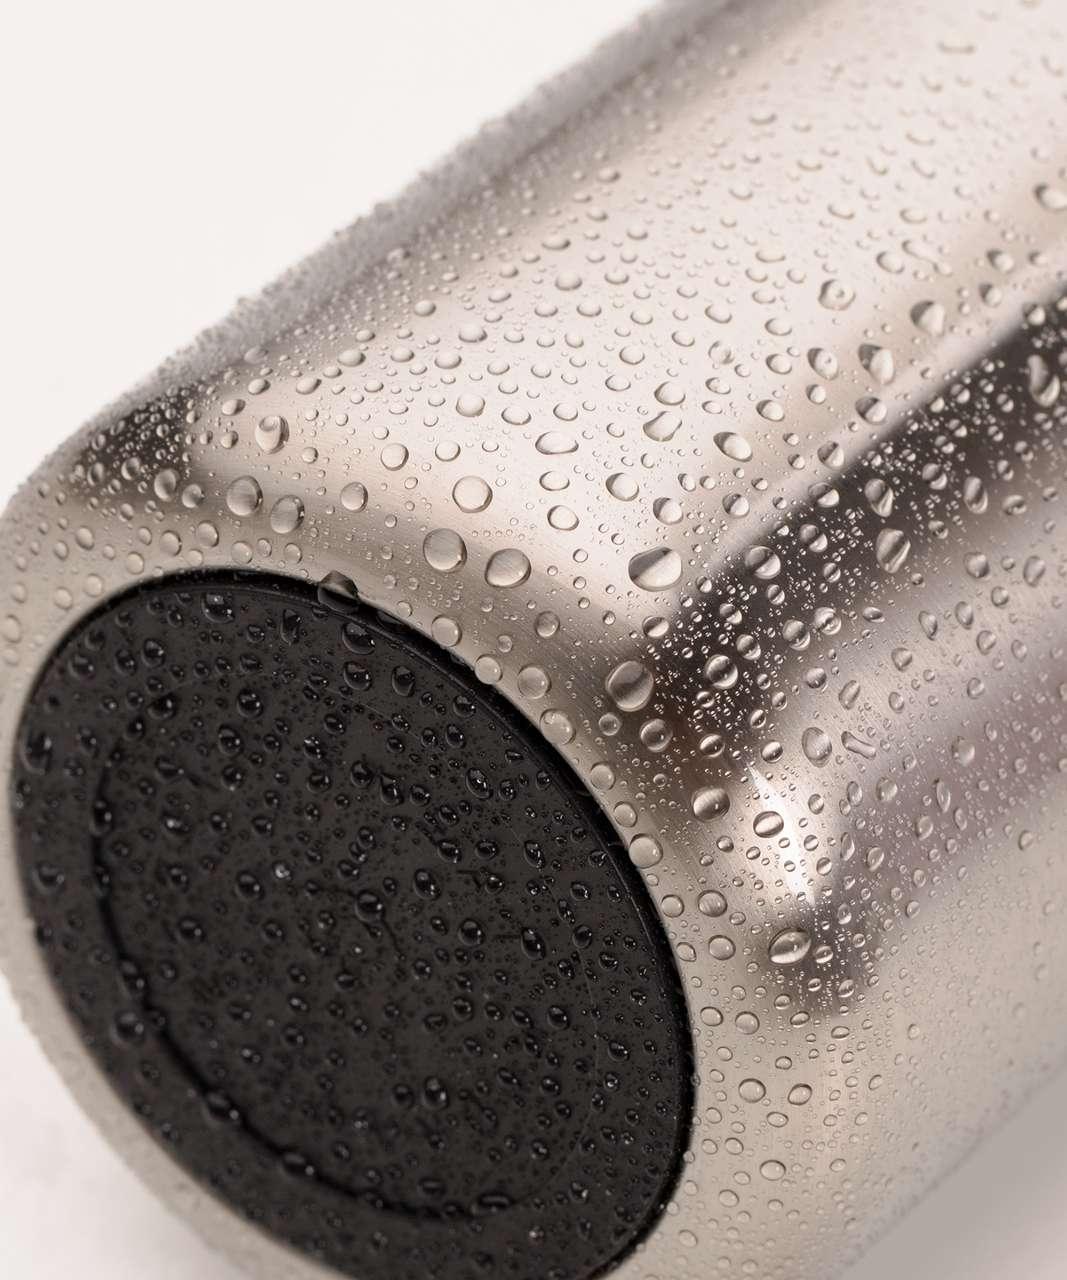 c1364a06e1 Lululemon Refresh Hot/Cold Bottle - Brushed Silver - lulu fanatics